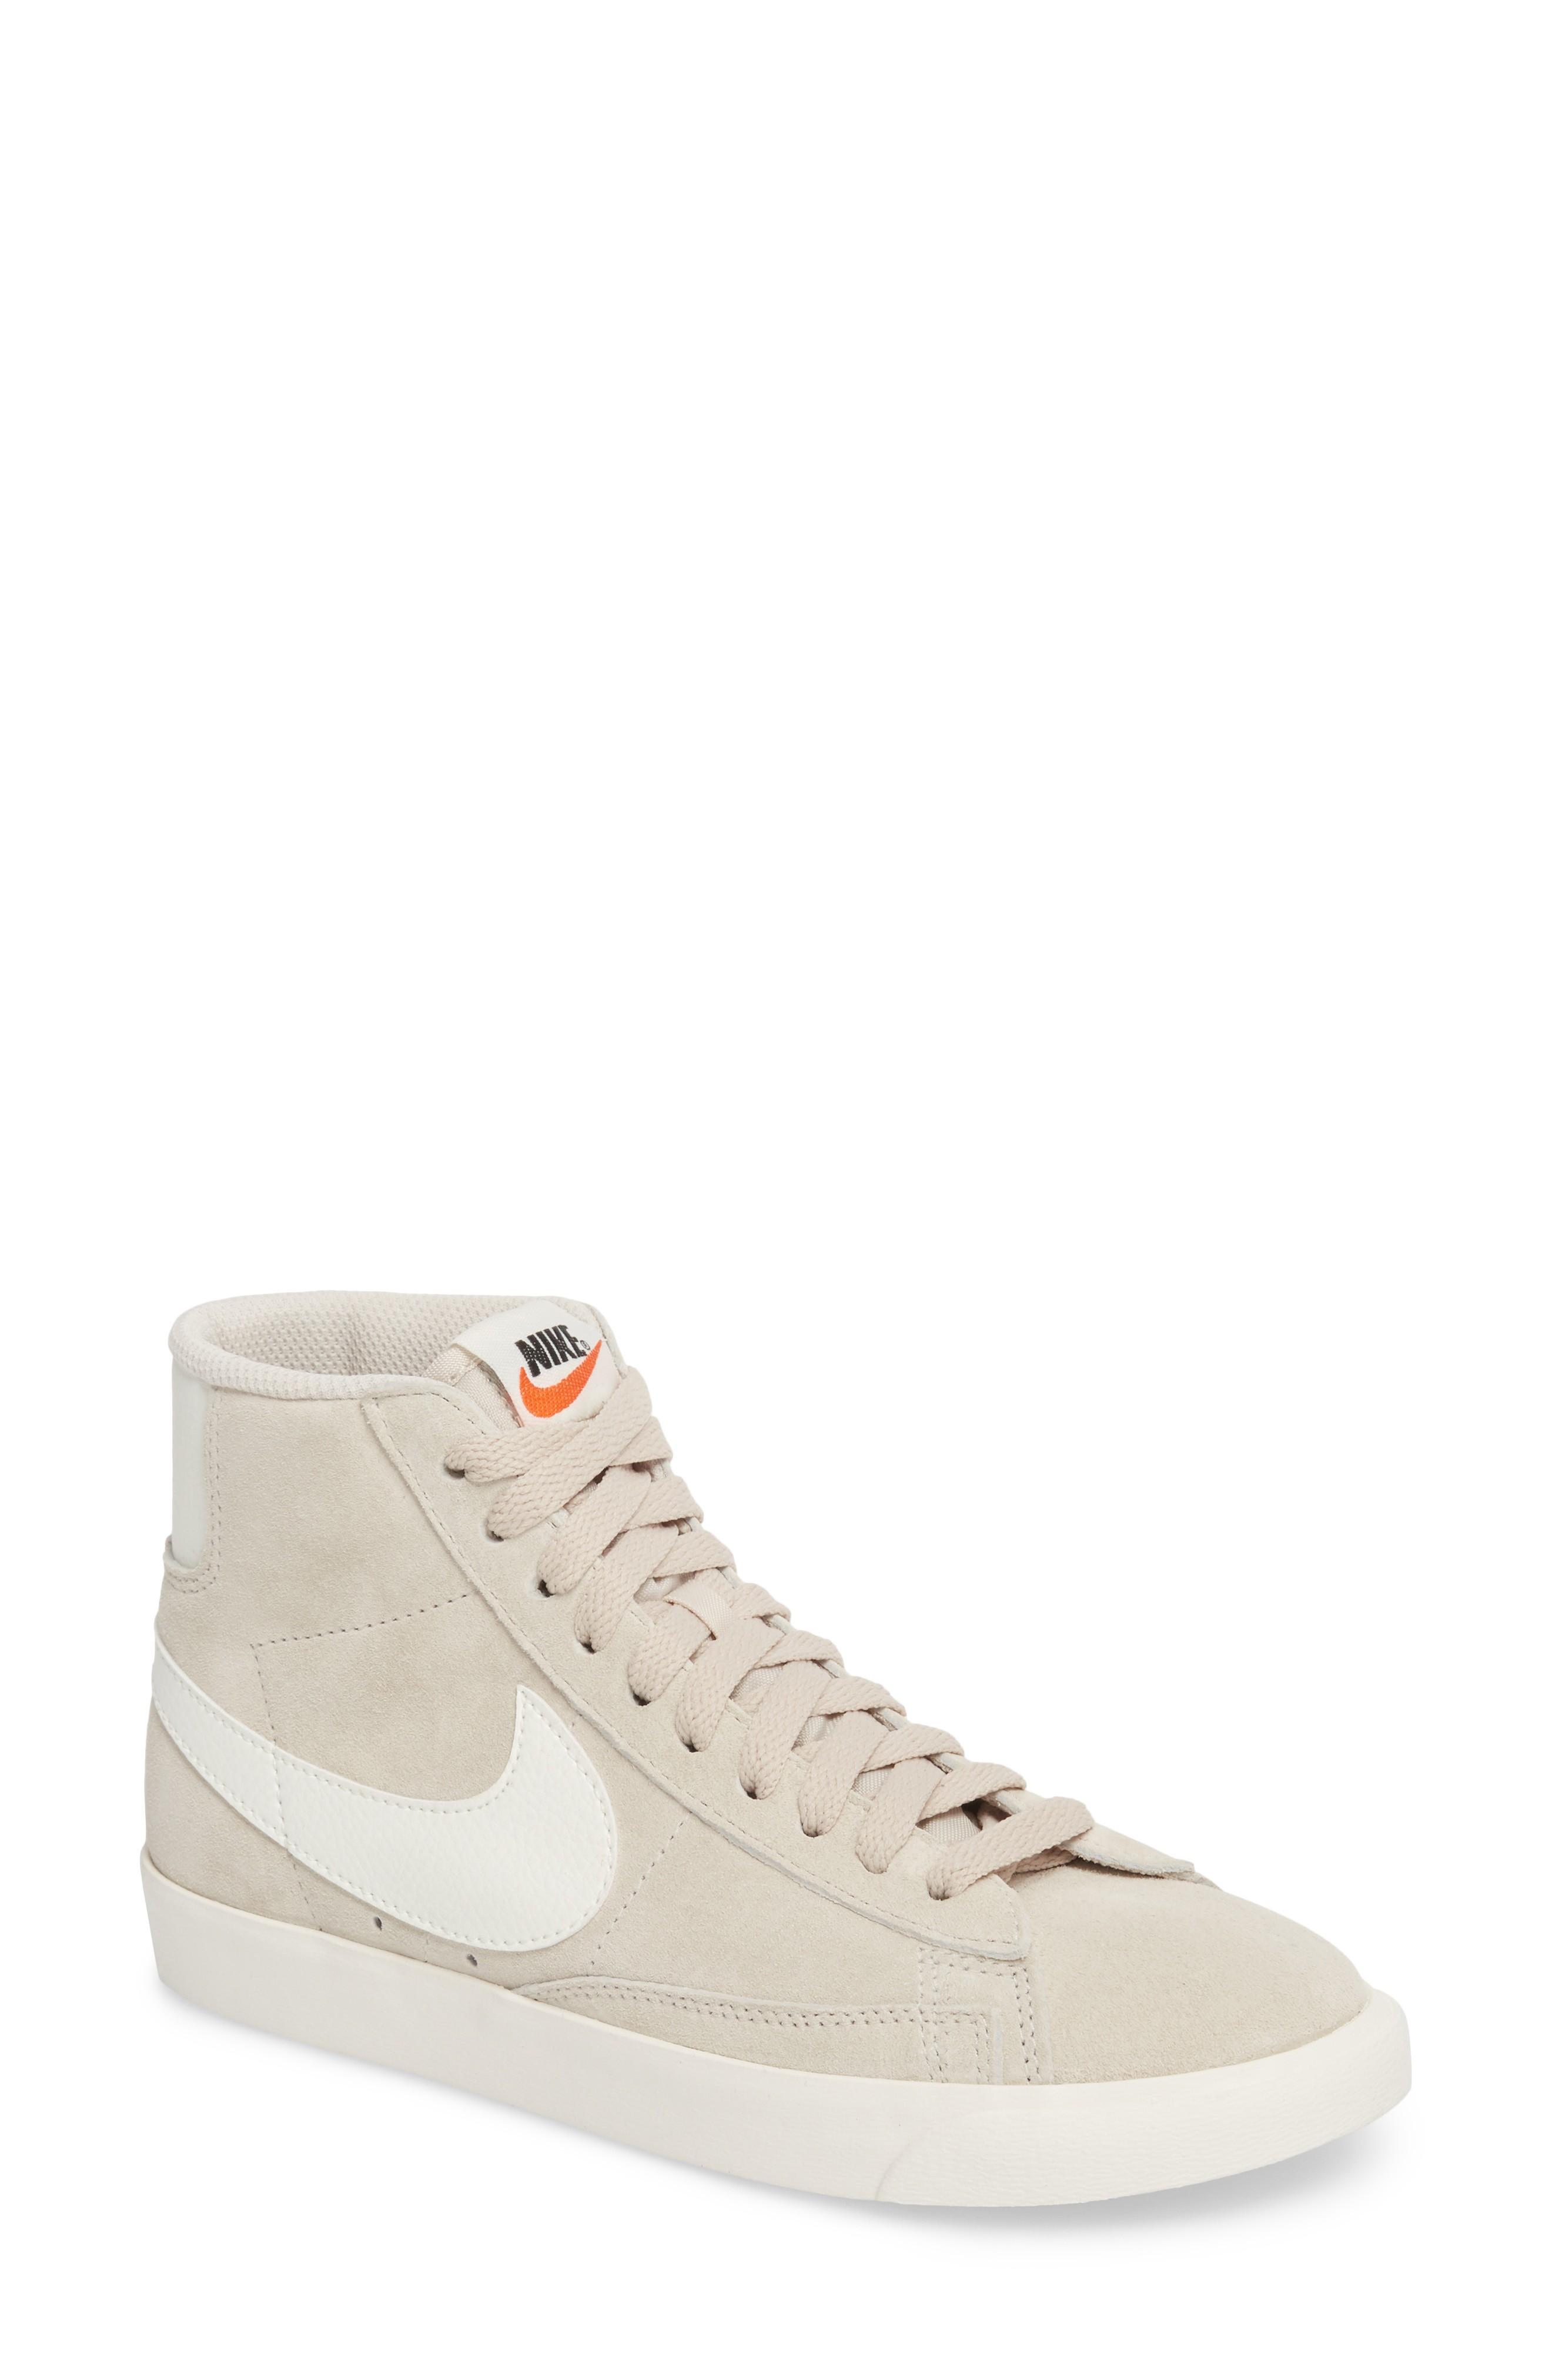 e795e6f2af8c6 Nike Women s Blazer Mid Vintage Suede Casual Shoes